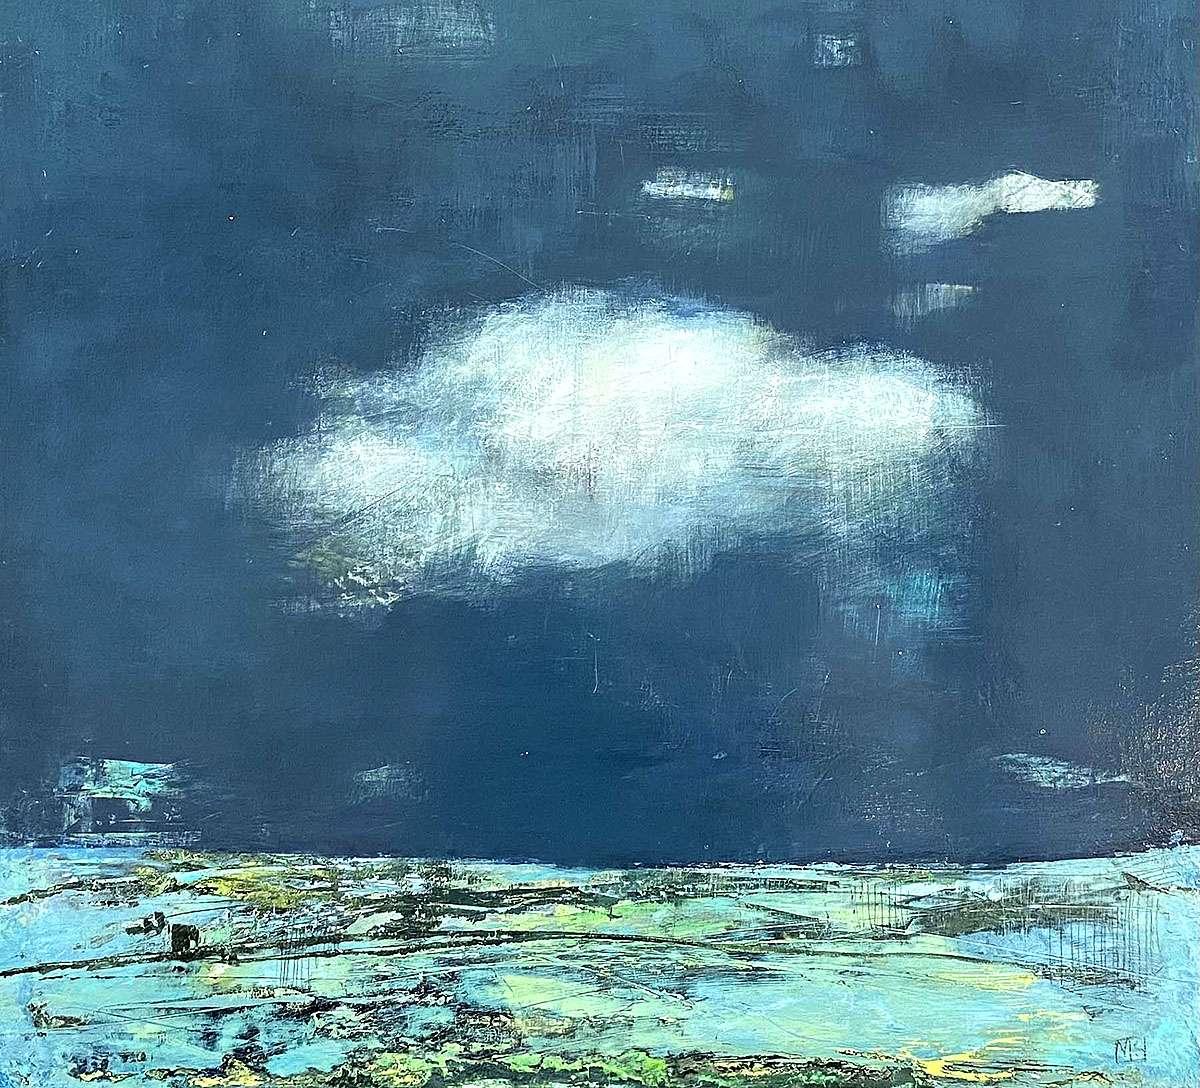 Morag Smith, 'Sometimes', acrylic on board